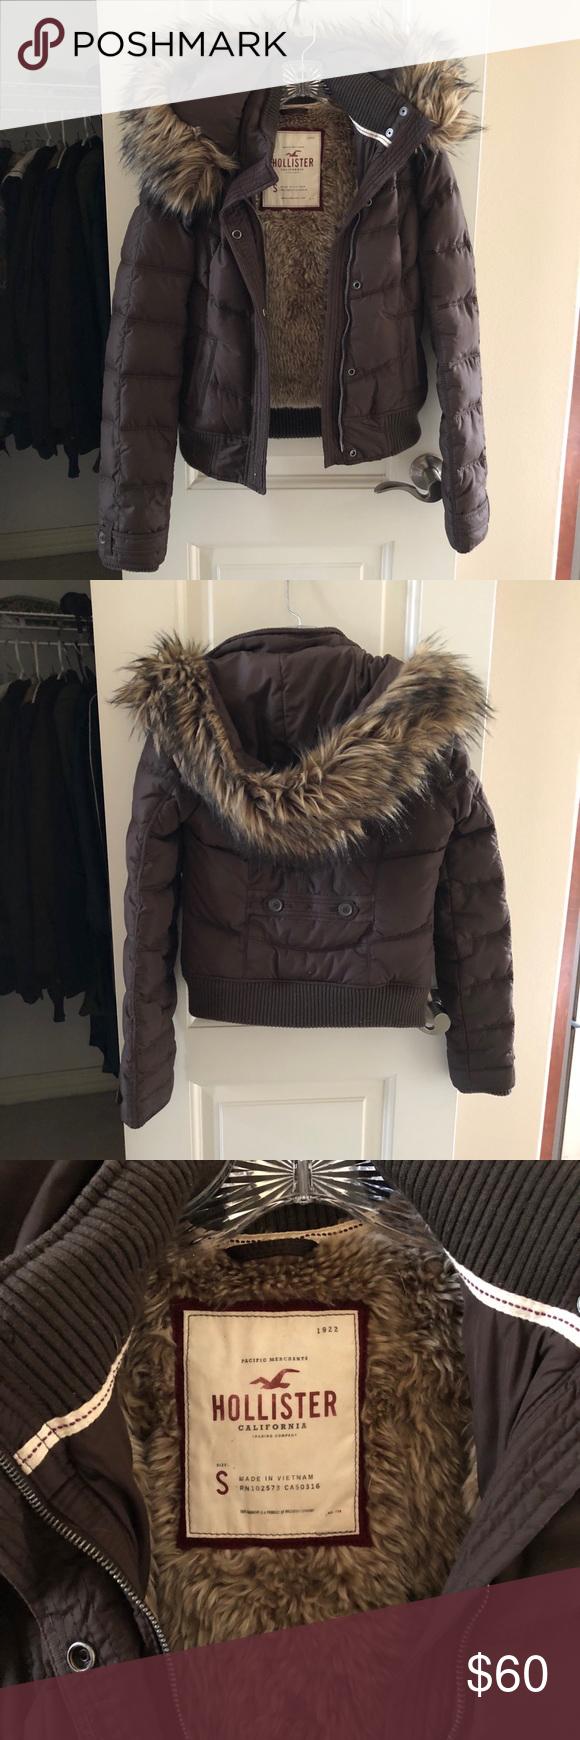 Final Drop Winter Snow Jacket Hollister Co Hollister Co Snow Jacket Jackets [ 1740 x 580 Pixel ]